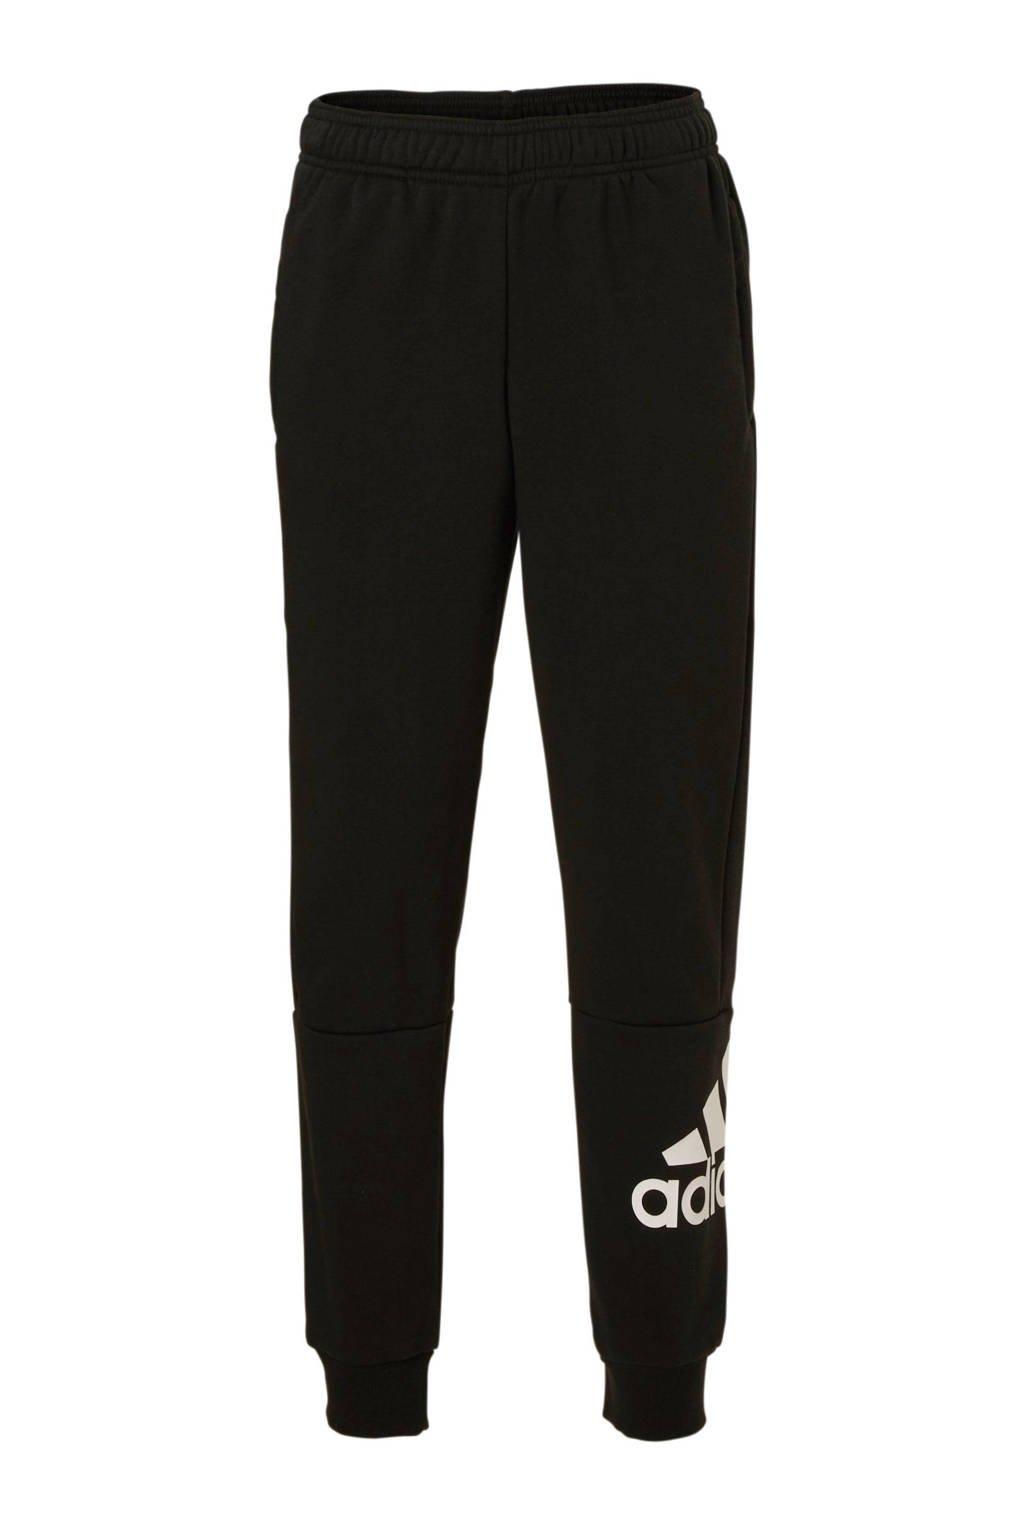 adidas performance   performance joggingbroek zwart, Zwart